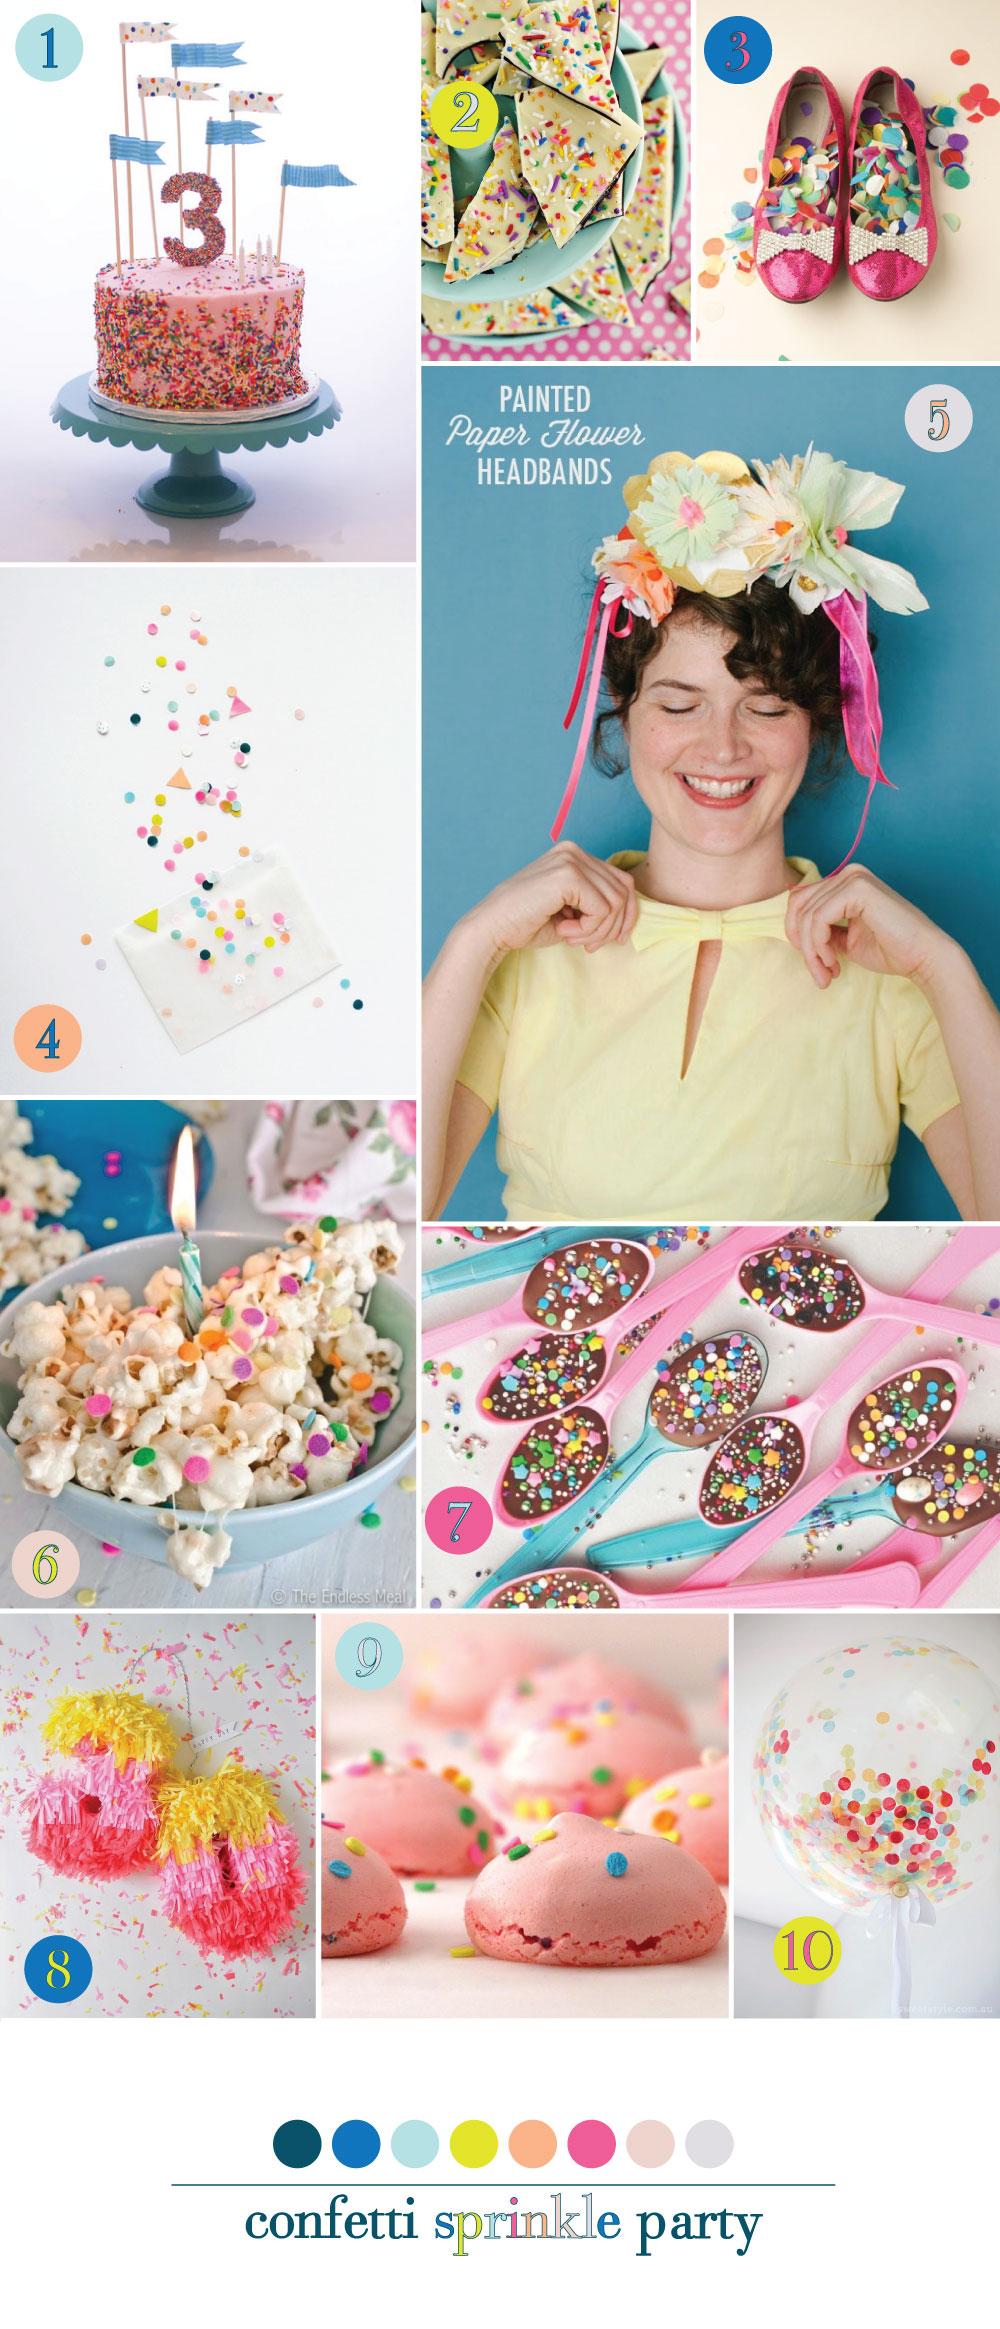 Confetti-Sprinkle-Inspiration-Board